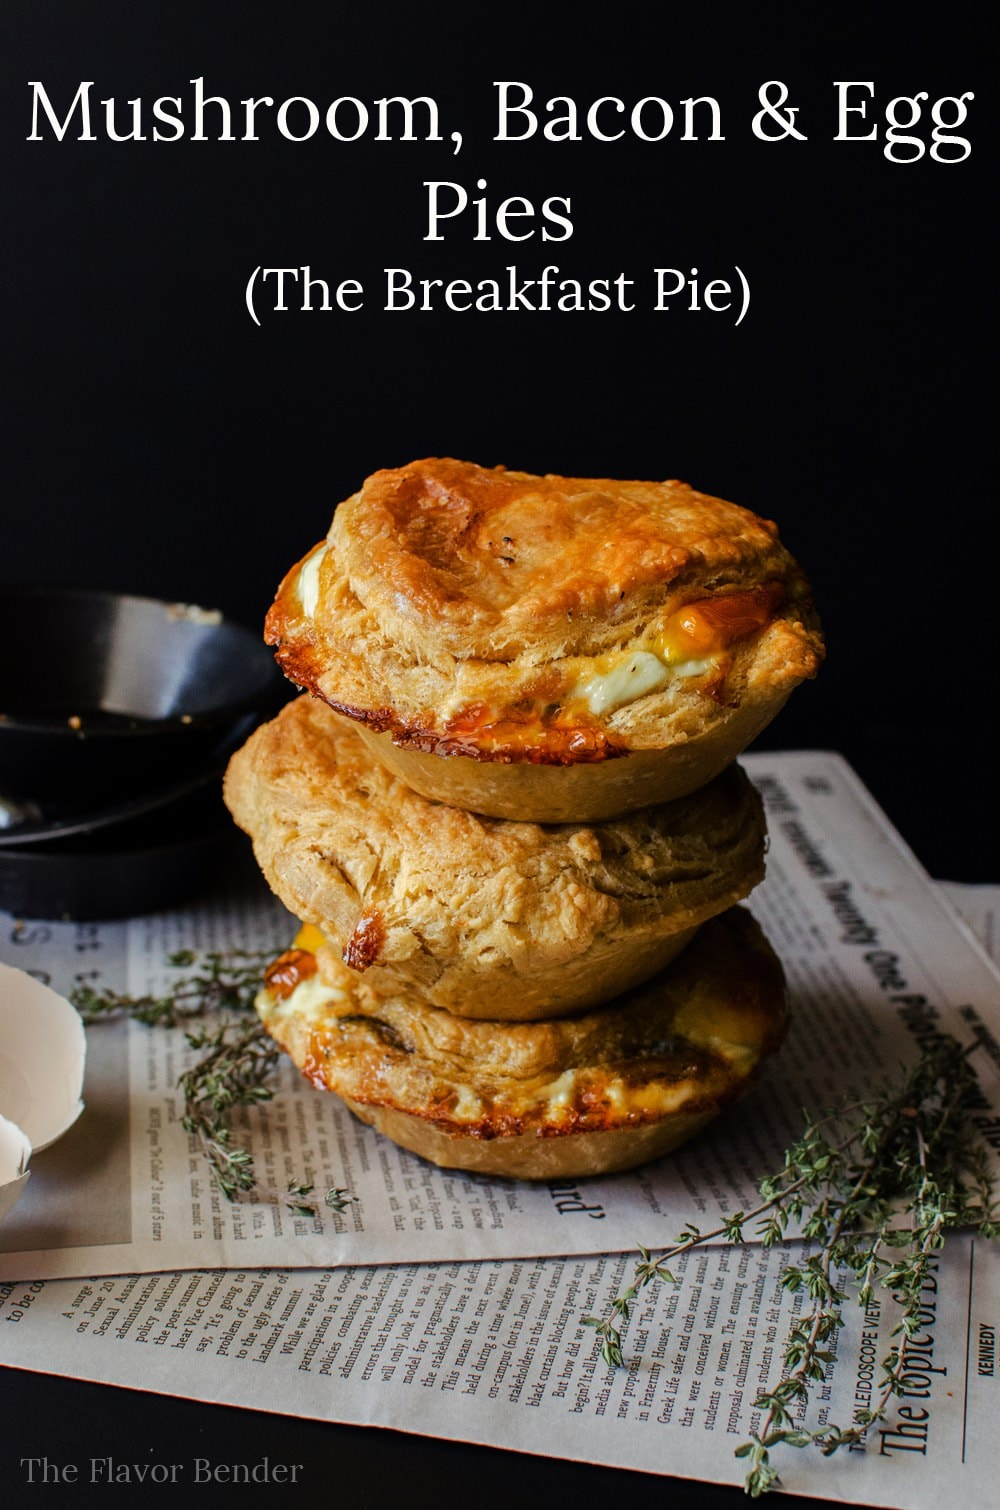 Breakfast Pie Recipe images